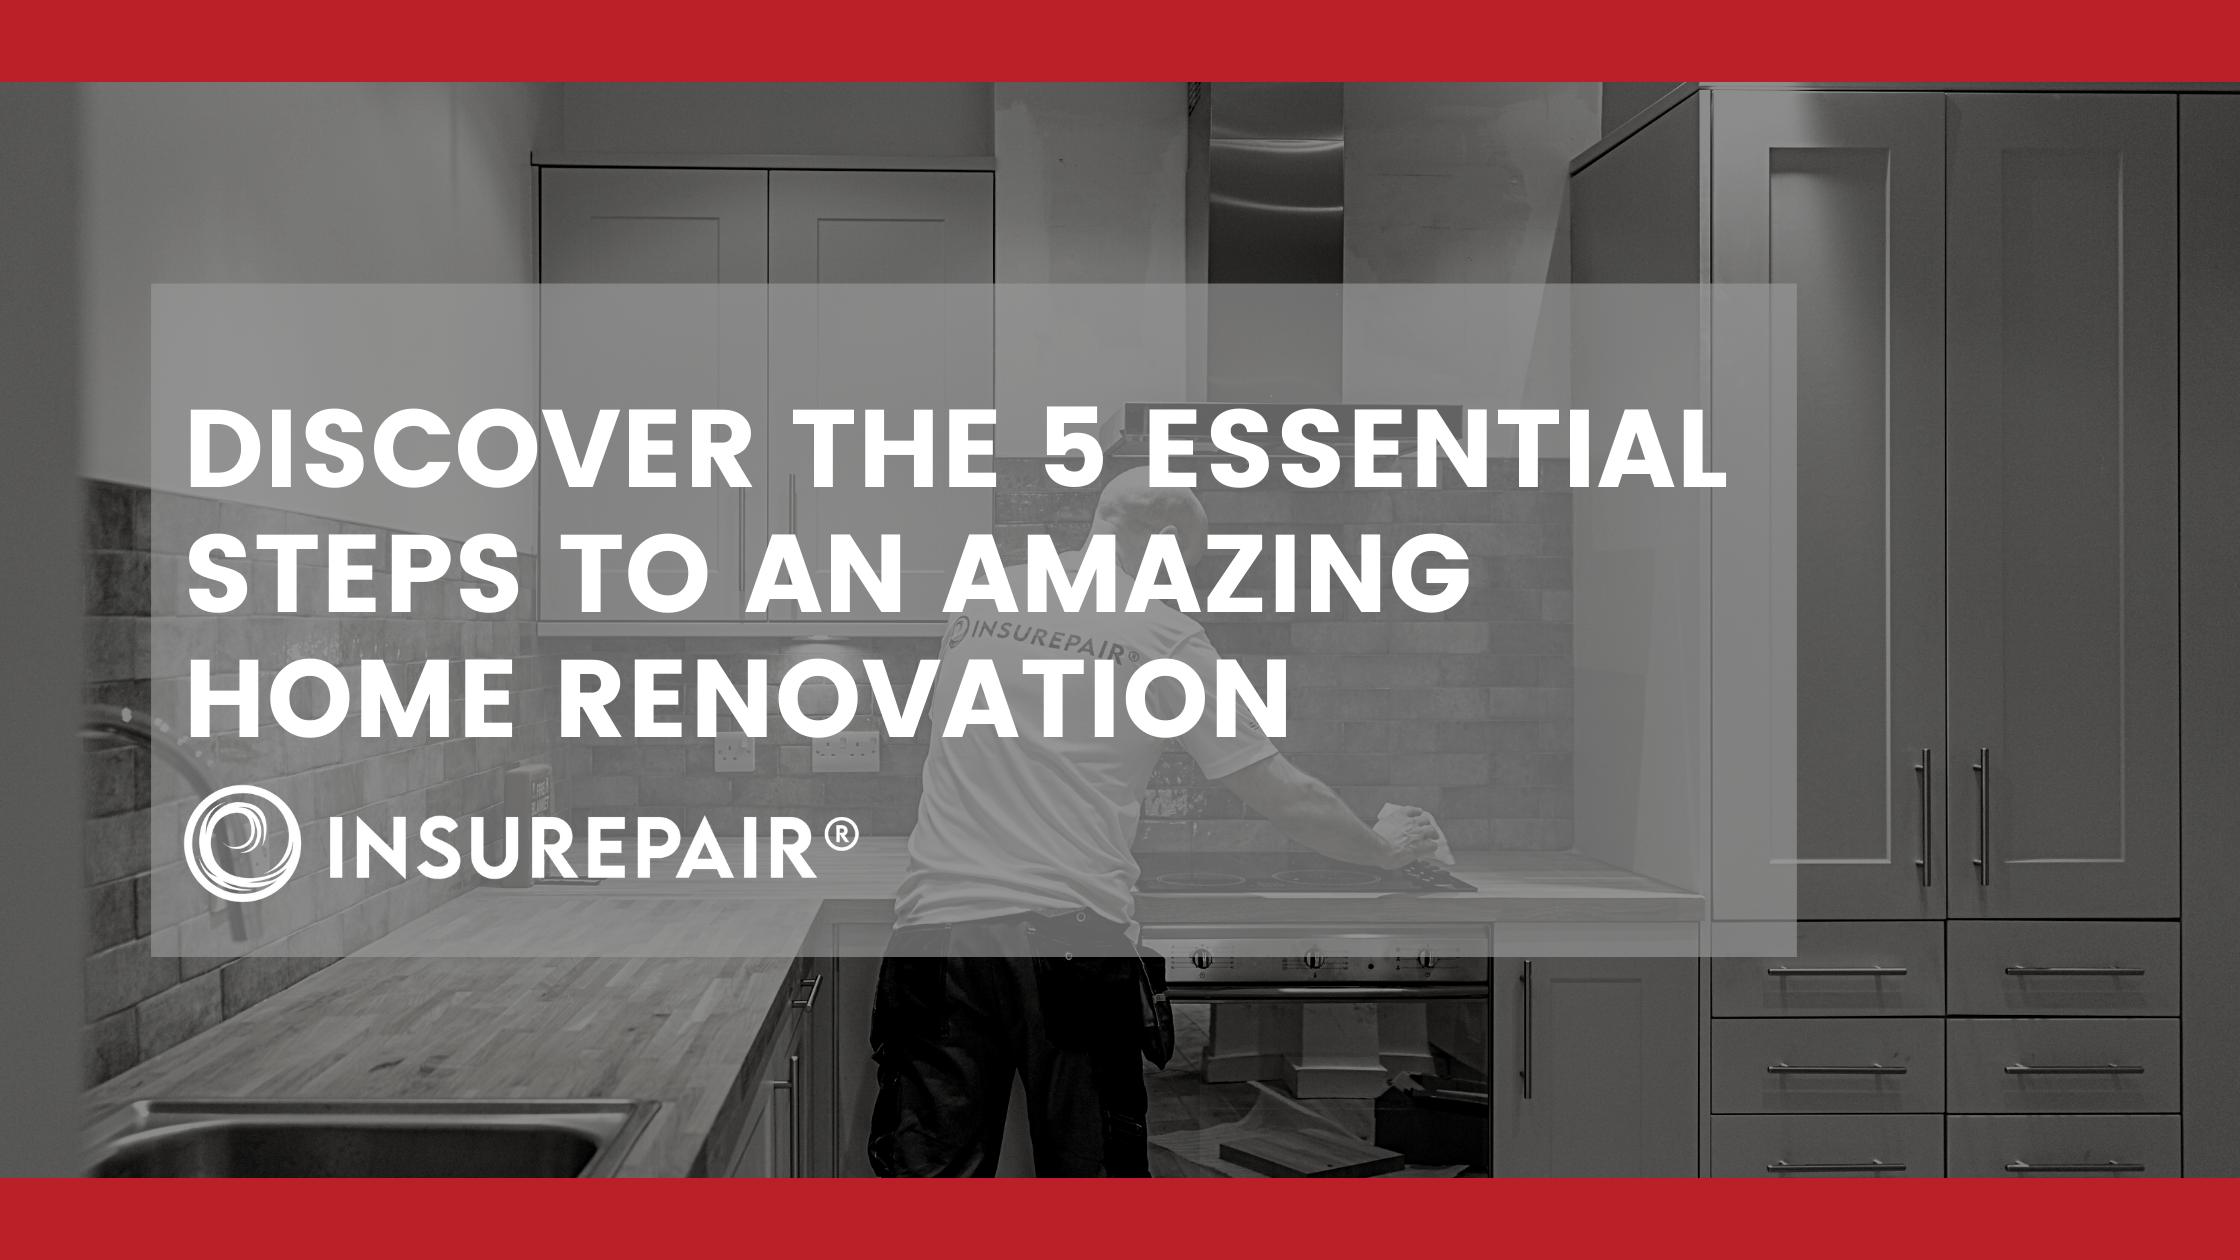 Where do I start with a Home Renovation?